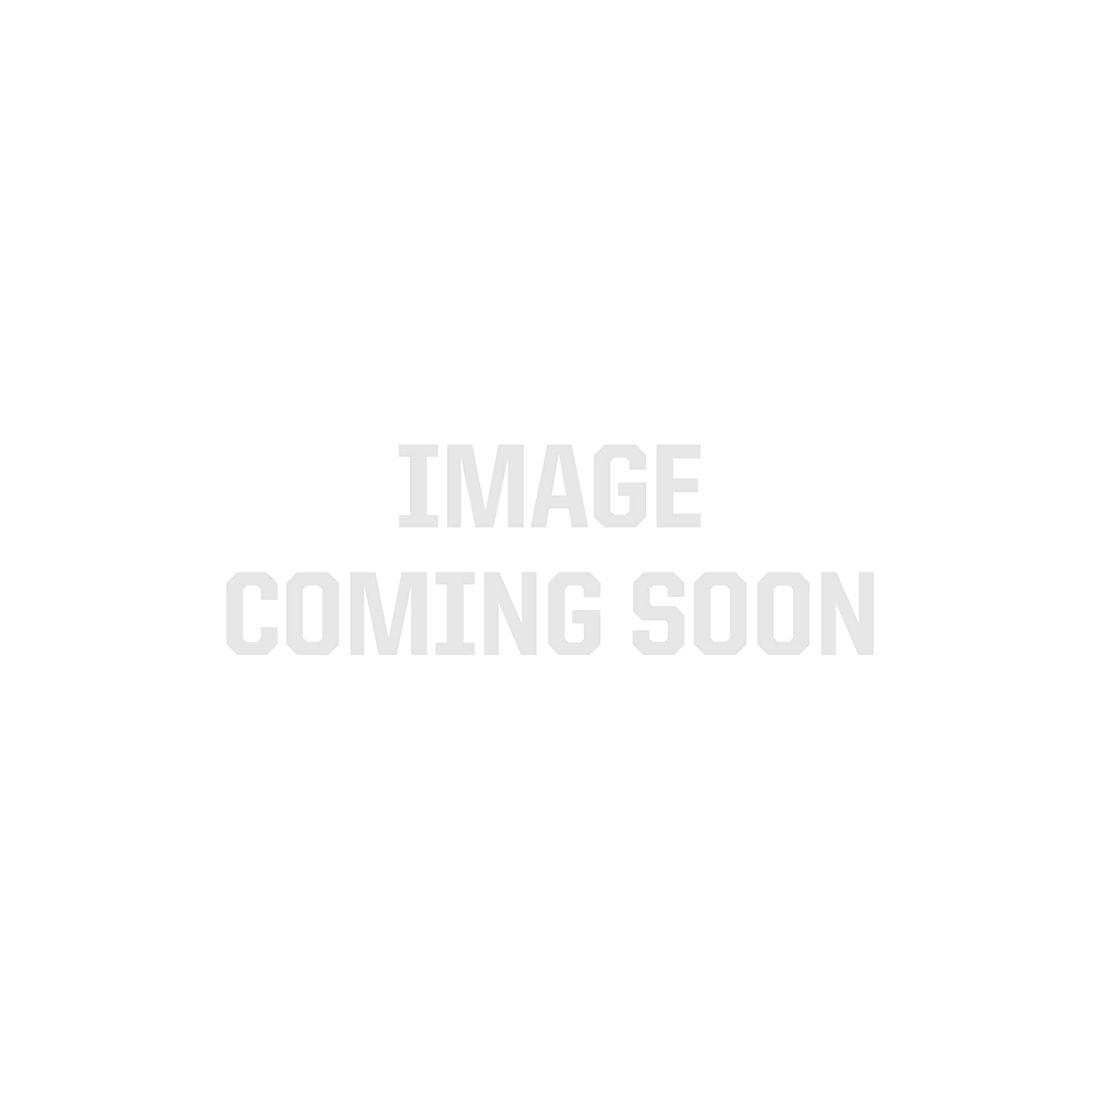 Waterproof RGB XL PixelControl LED Strip Light, 60/m, 12mm